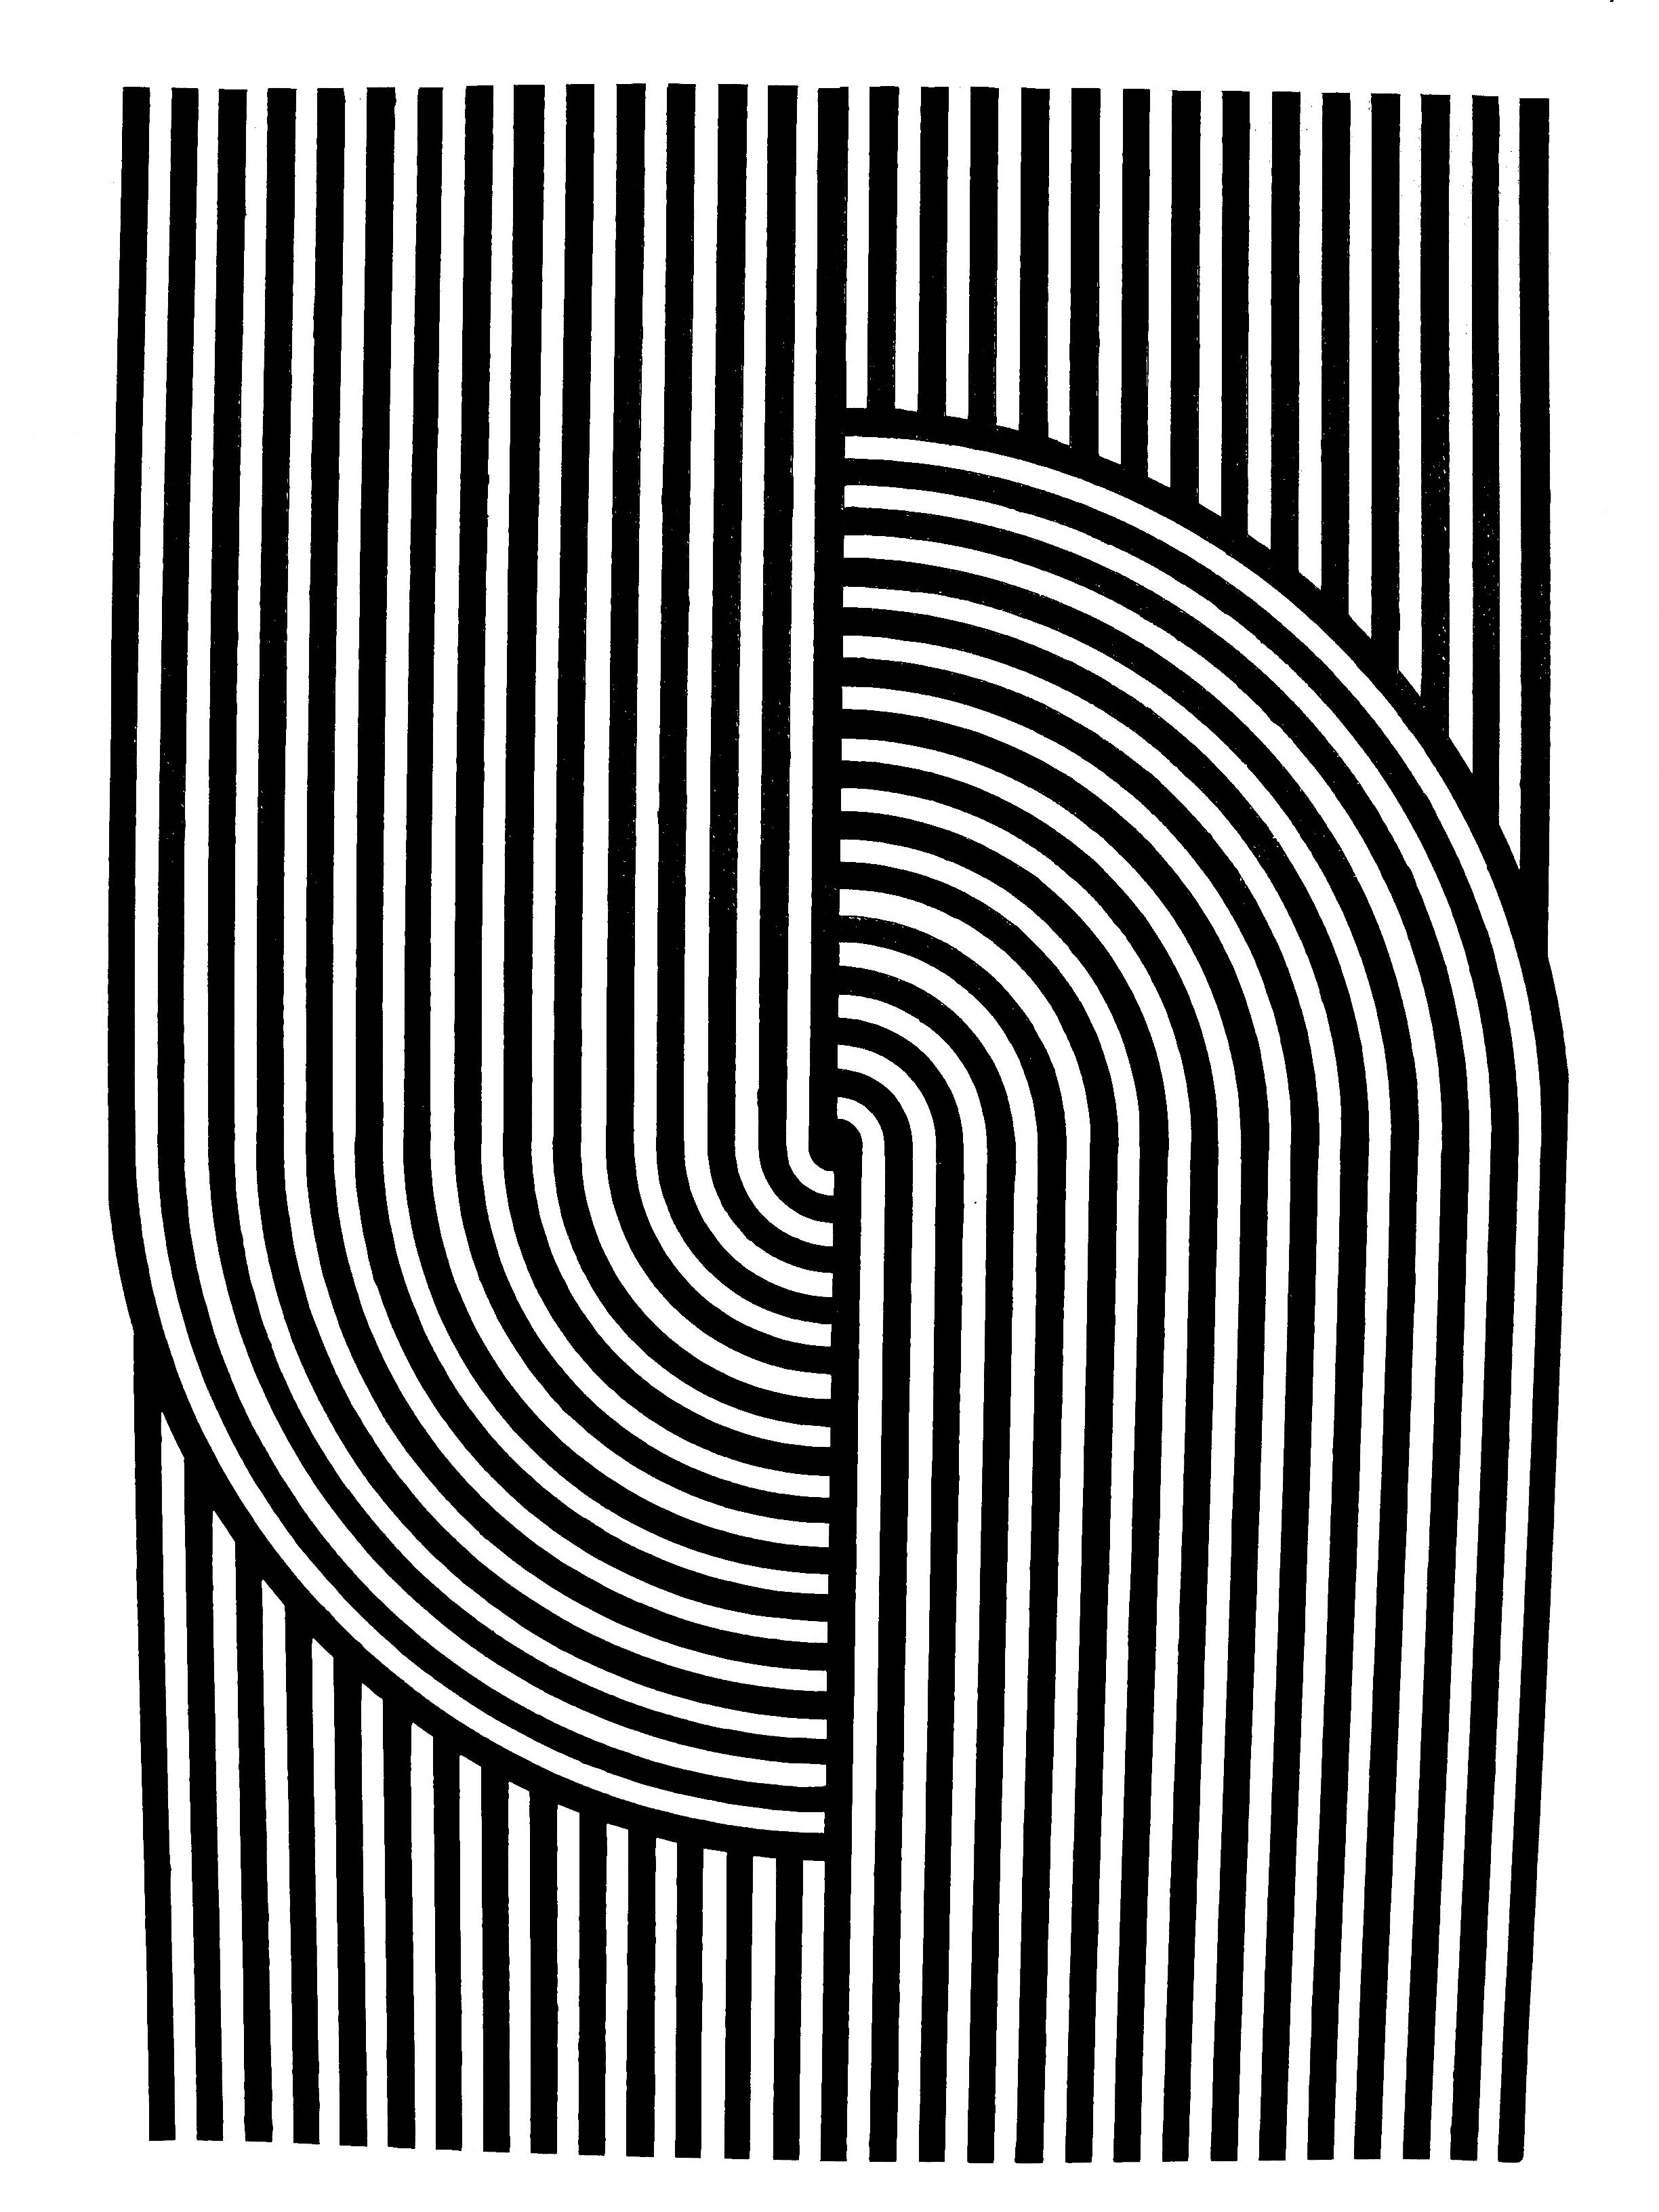 'Maxwell' (painting) - paper, ink (29.7x42cm) agotasjostrom.com